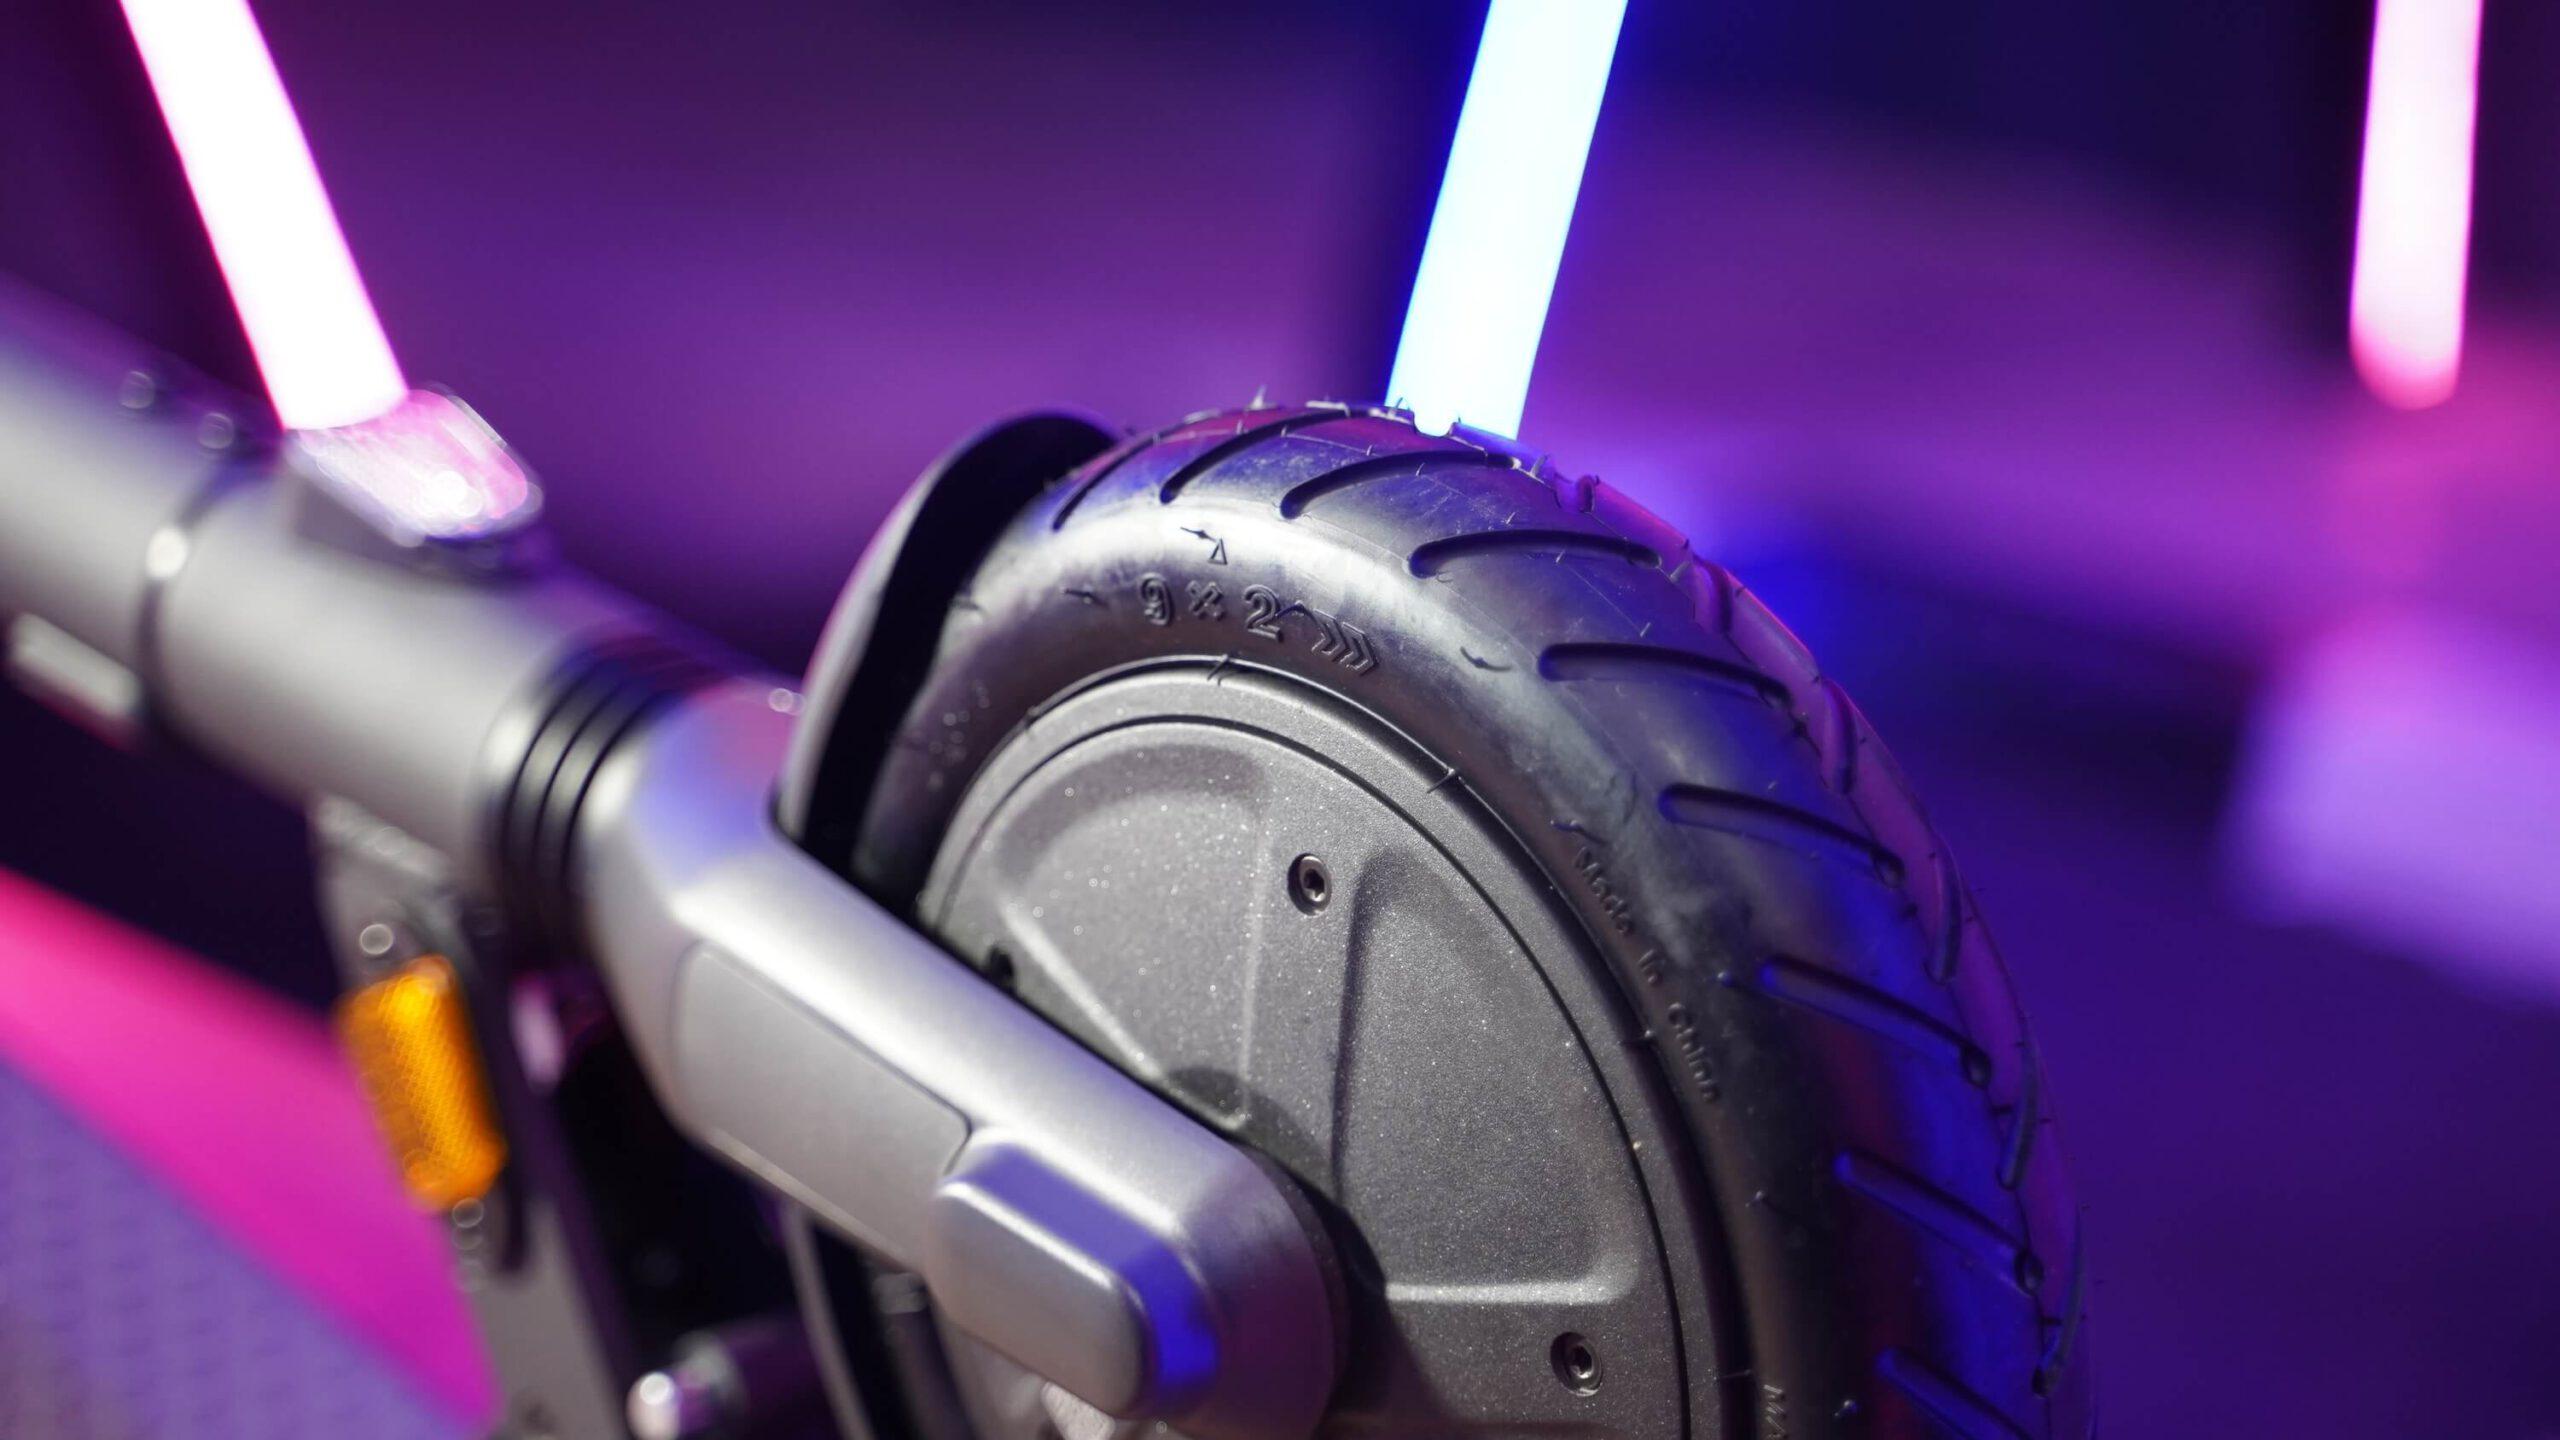 ninebot kickscooter e25-มอเตอร์